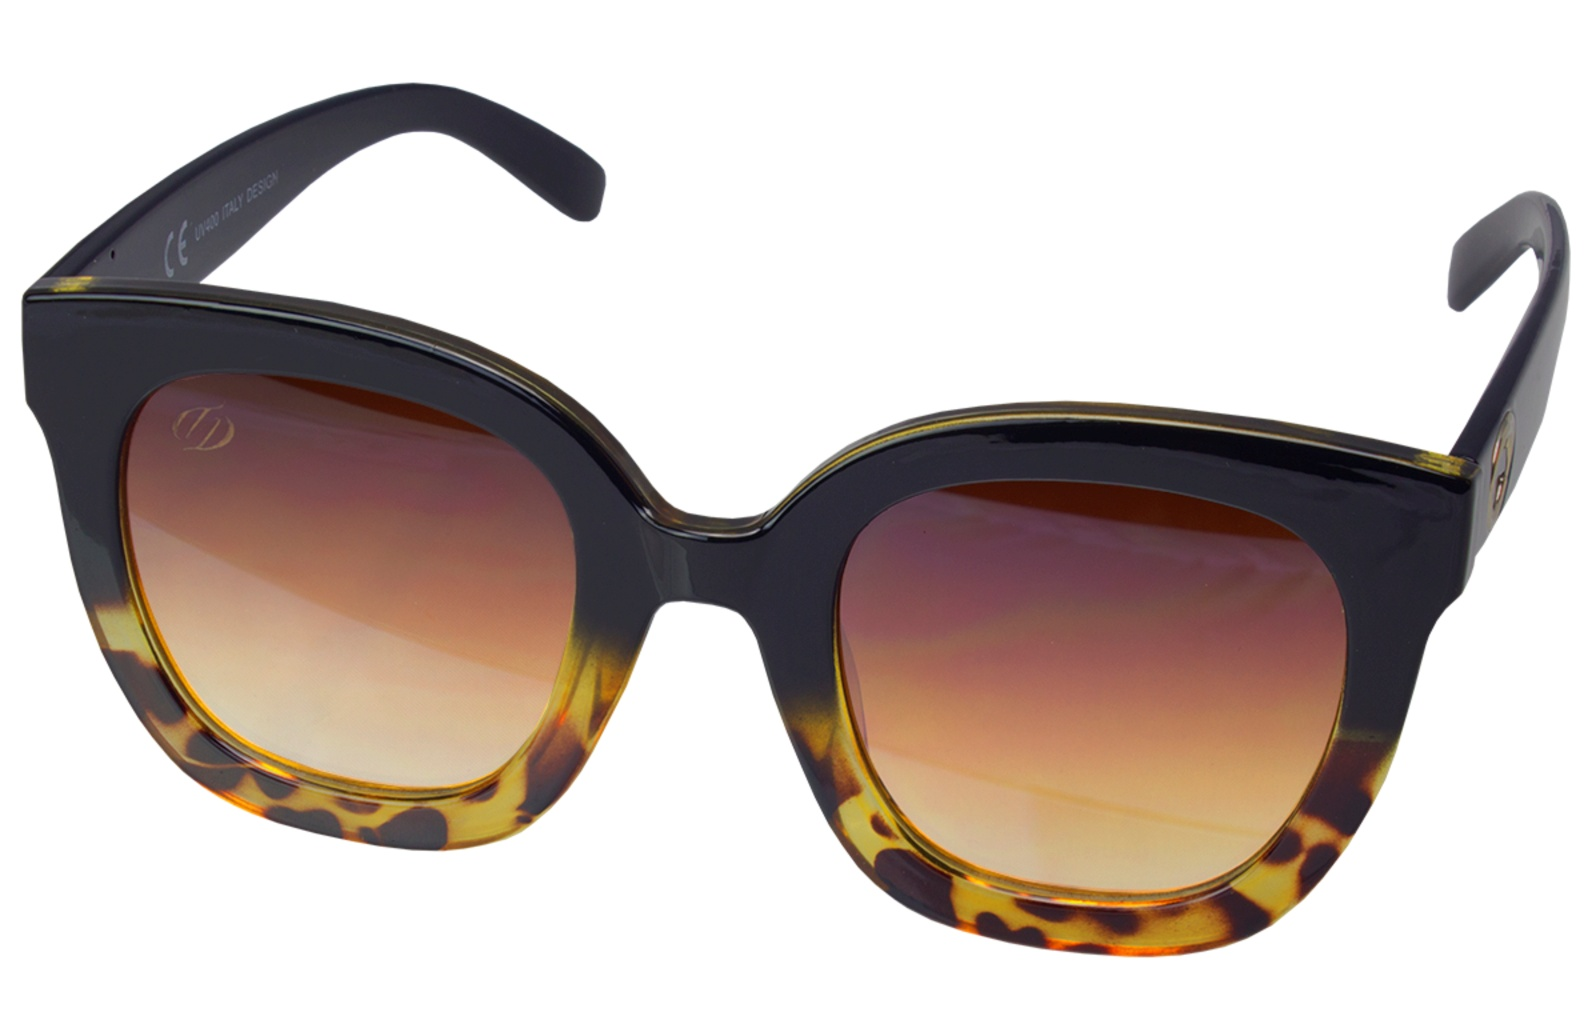 Óculos De Sol Tilit Feminino Acetato Oversize - Preto Tarta